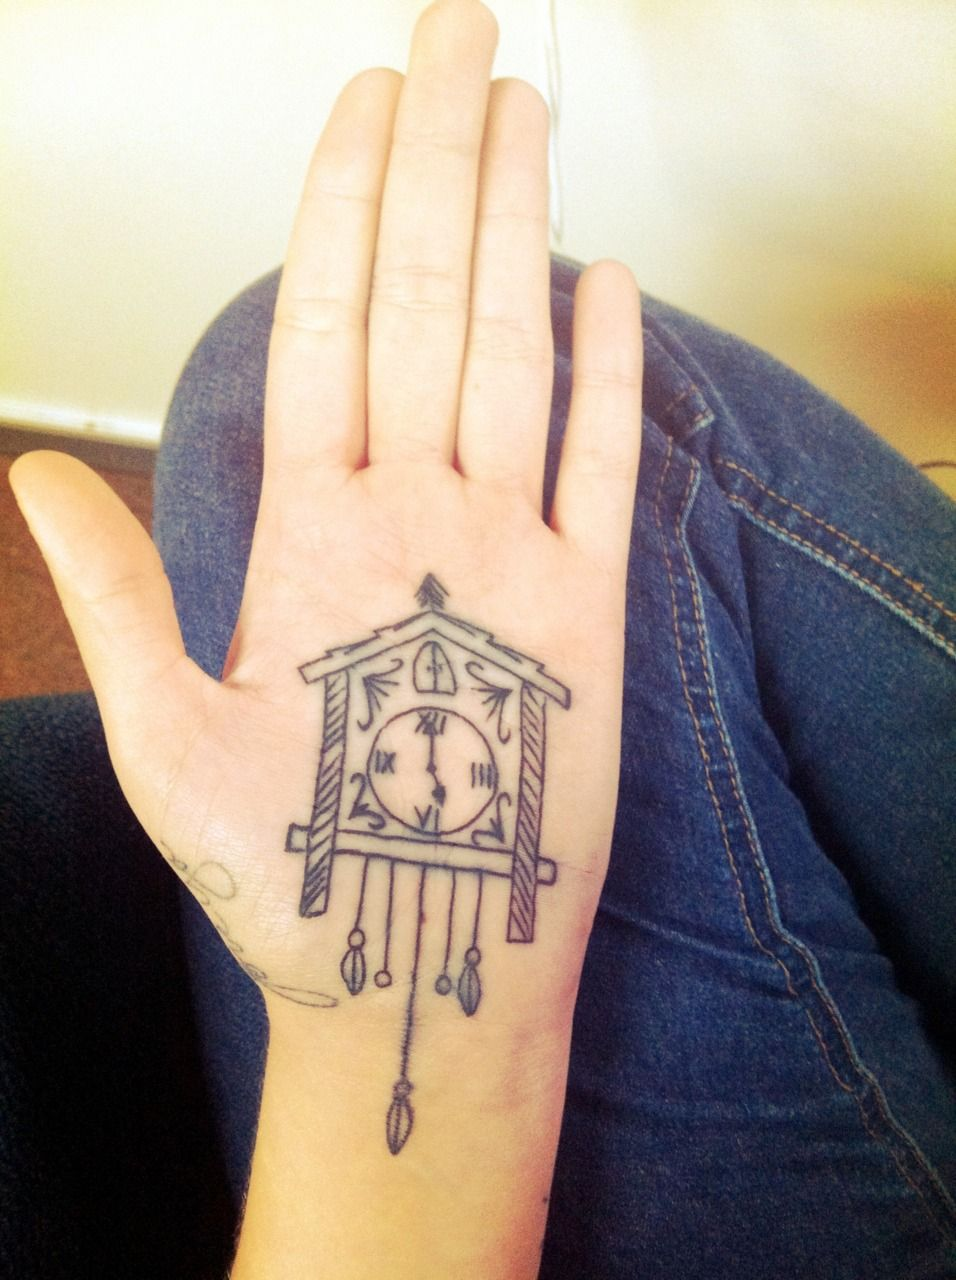 Cool tattoo designs for your hand kookoo clock  t a t t o o s ueueue  pinterest  clocks palm tattoos